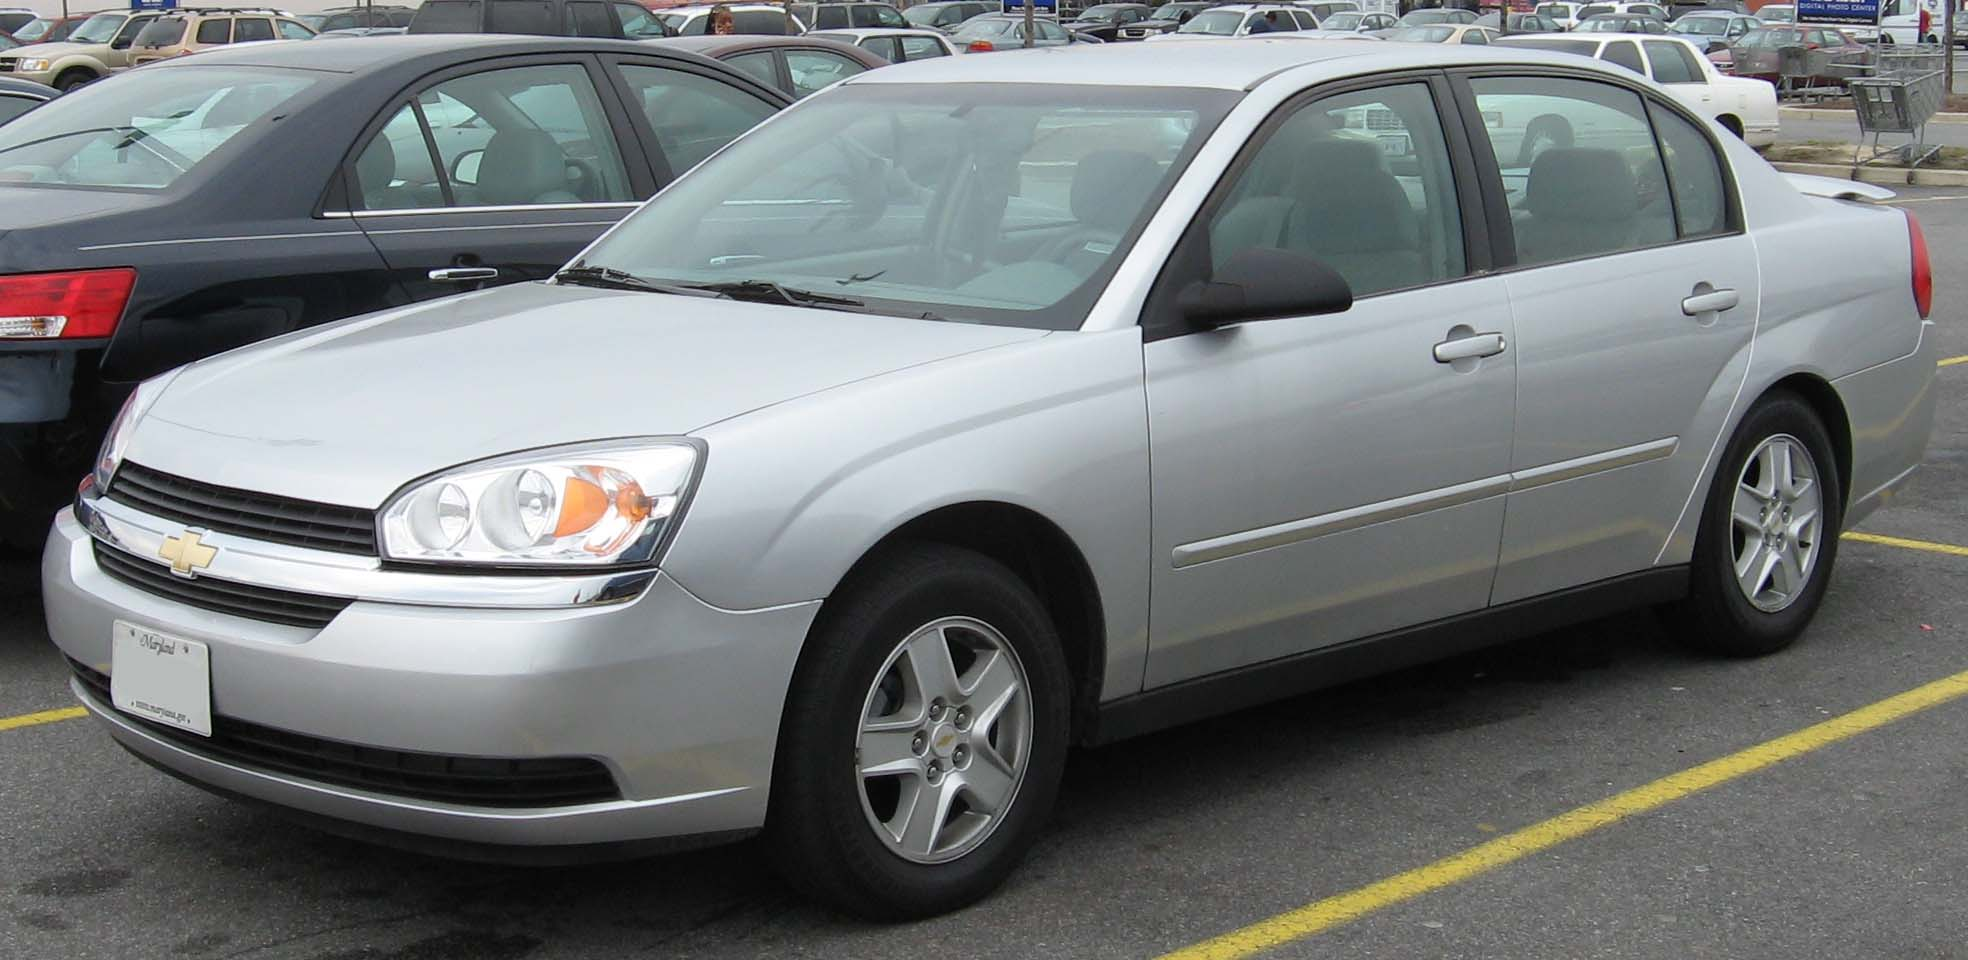 Chevrolet Malibu 2004 foto - 1